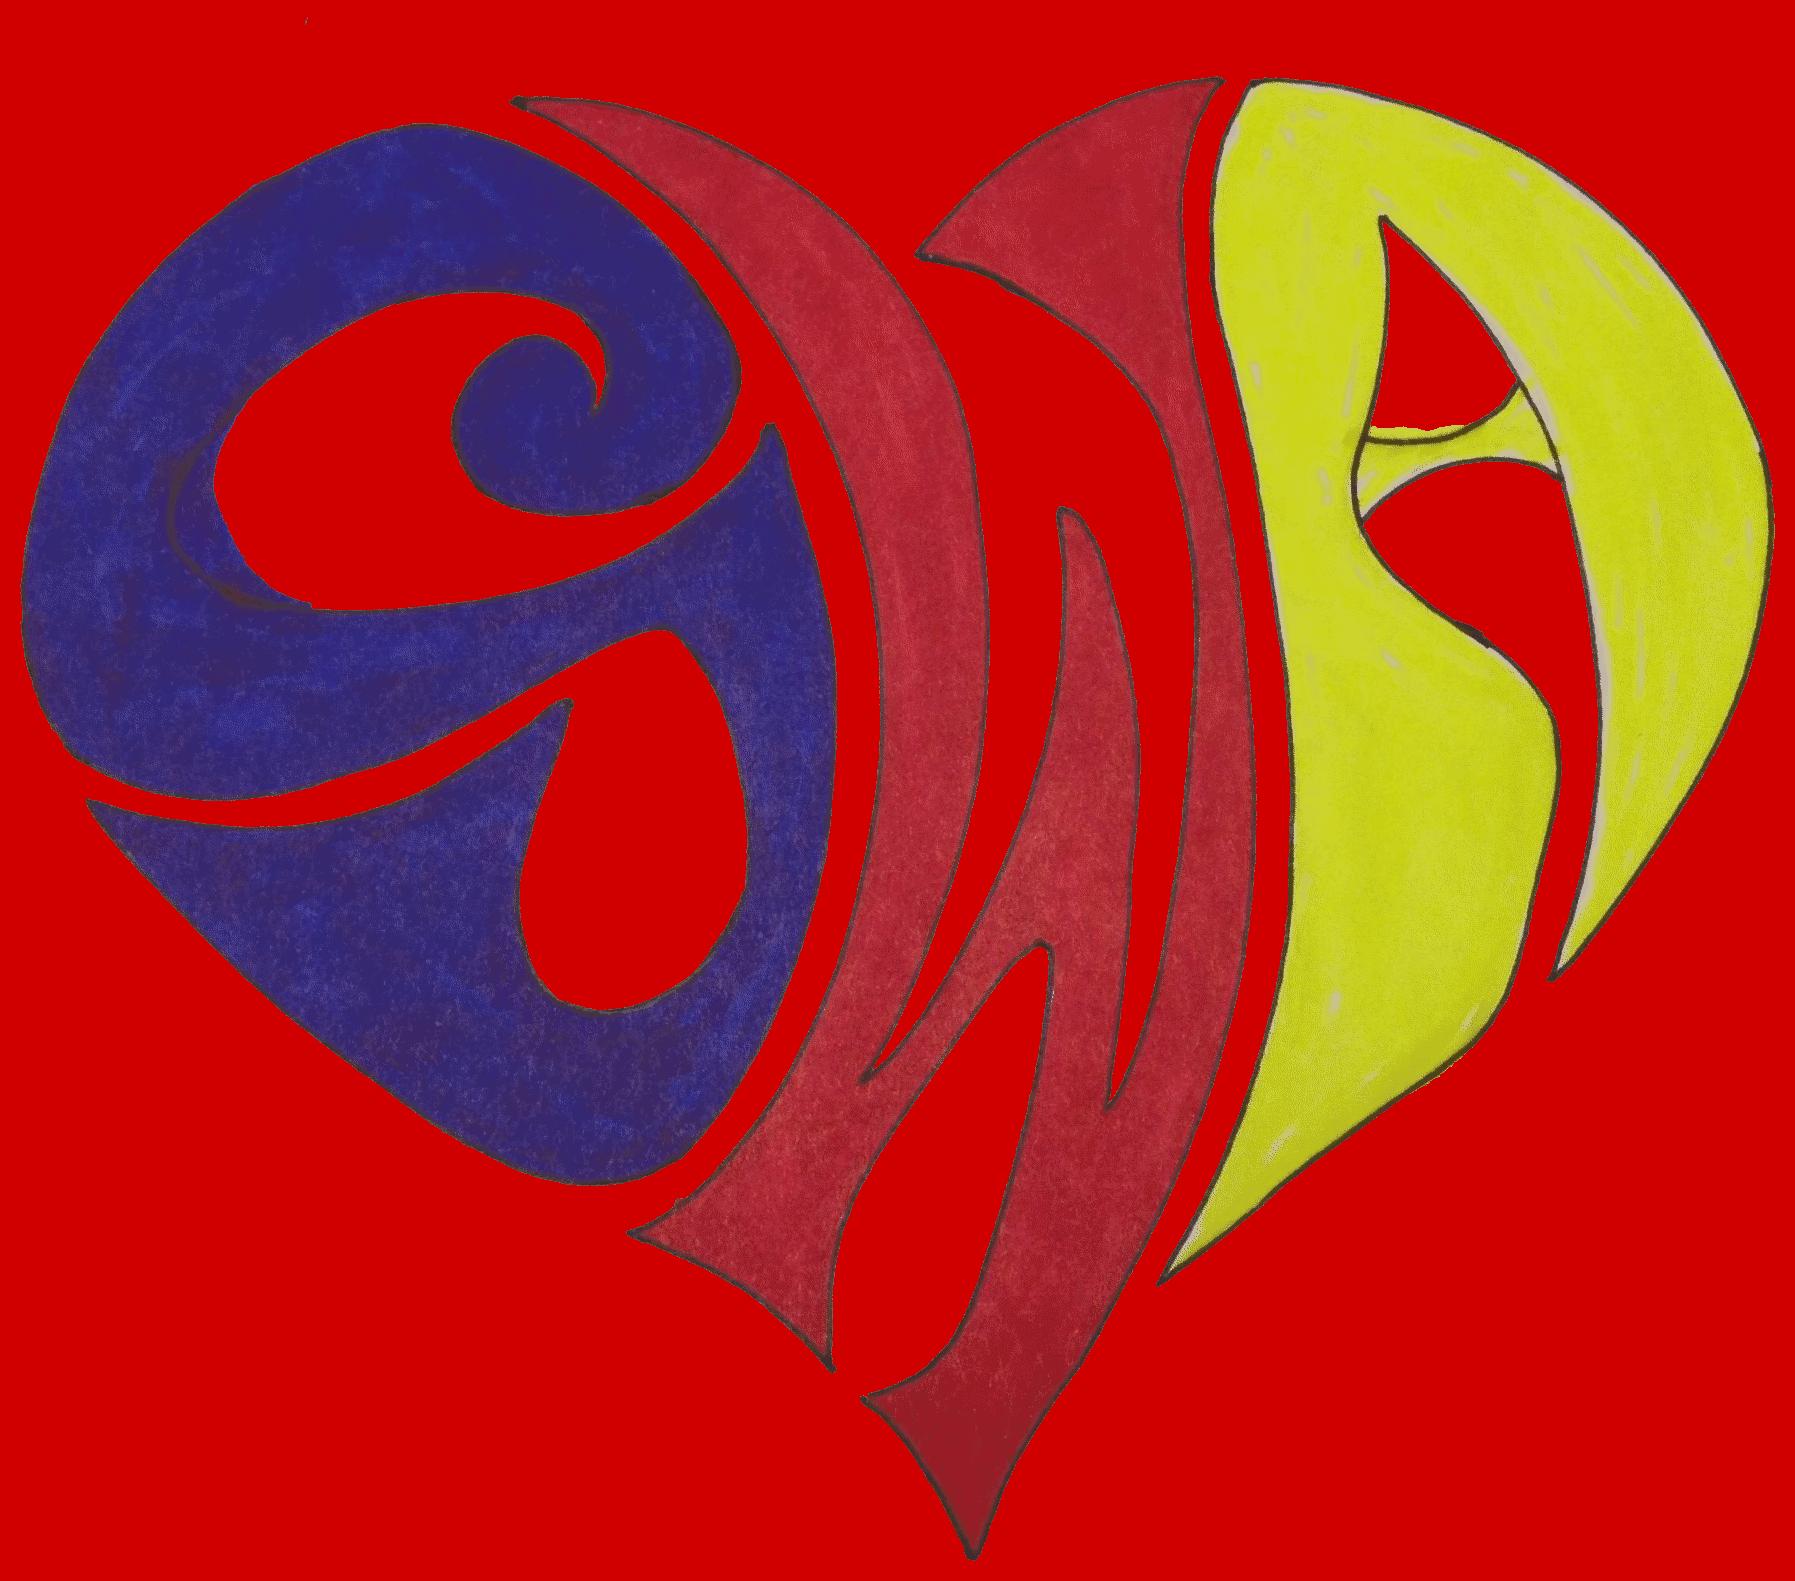 SWA Heart